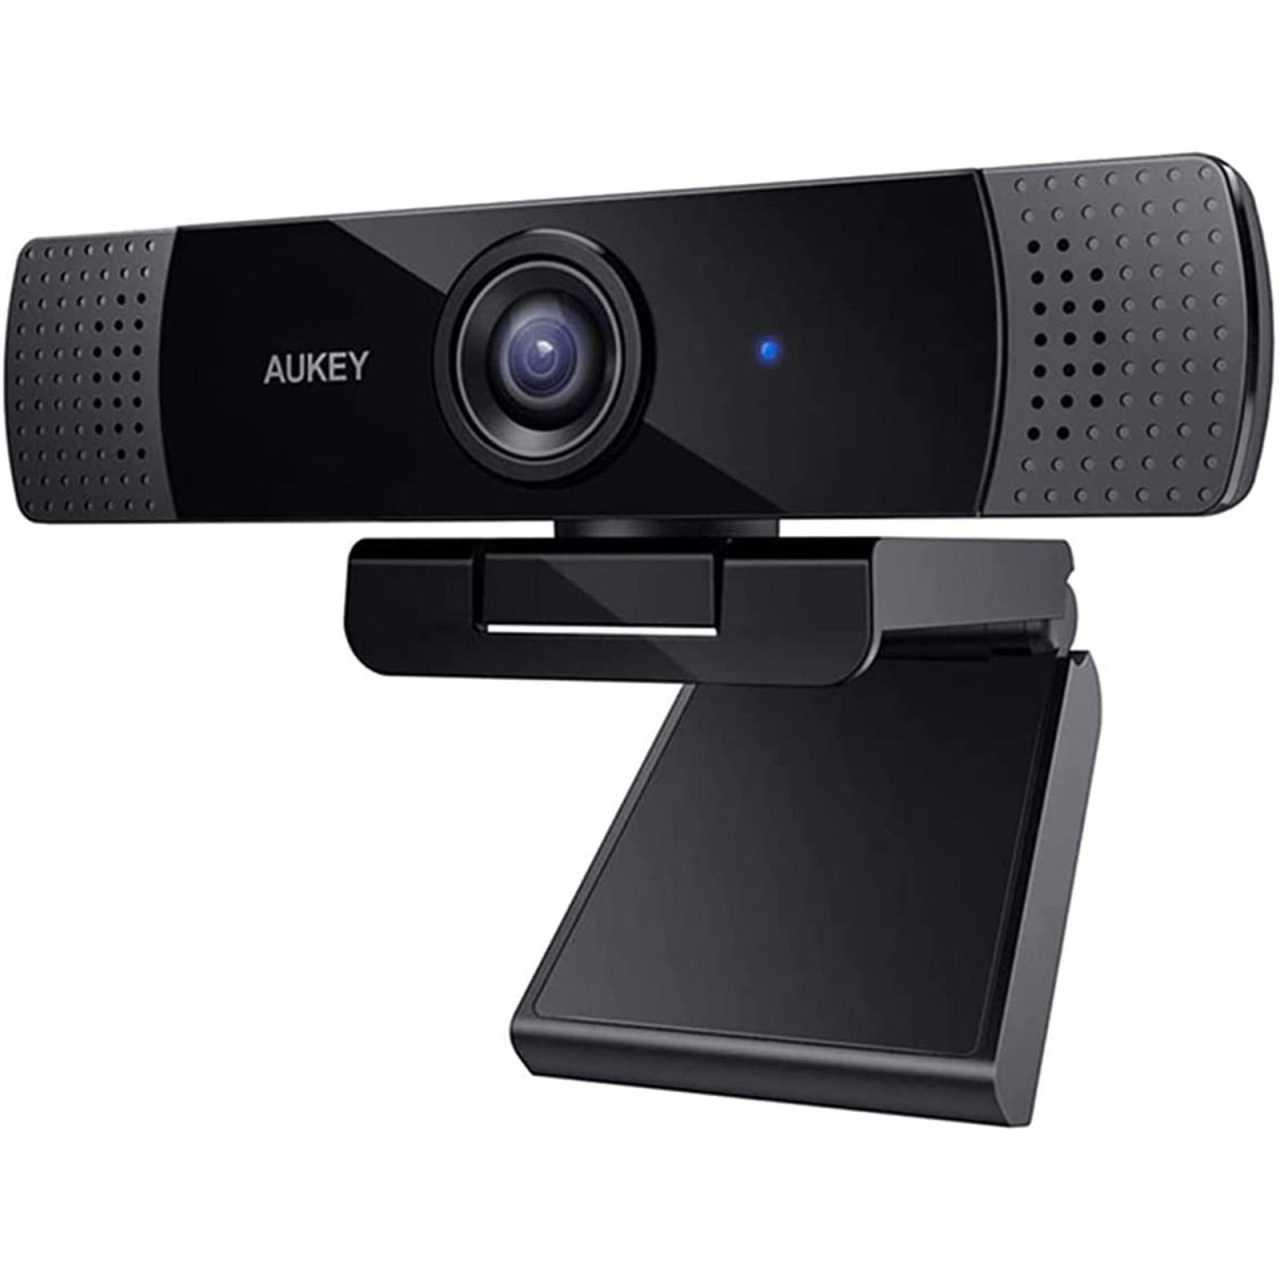 AUKEY Webcam PC-LME1 Full HD 1080p 30fps 2 Megapixel mit Stereo Mikrofon Schwarz WEBCAM02